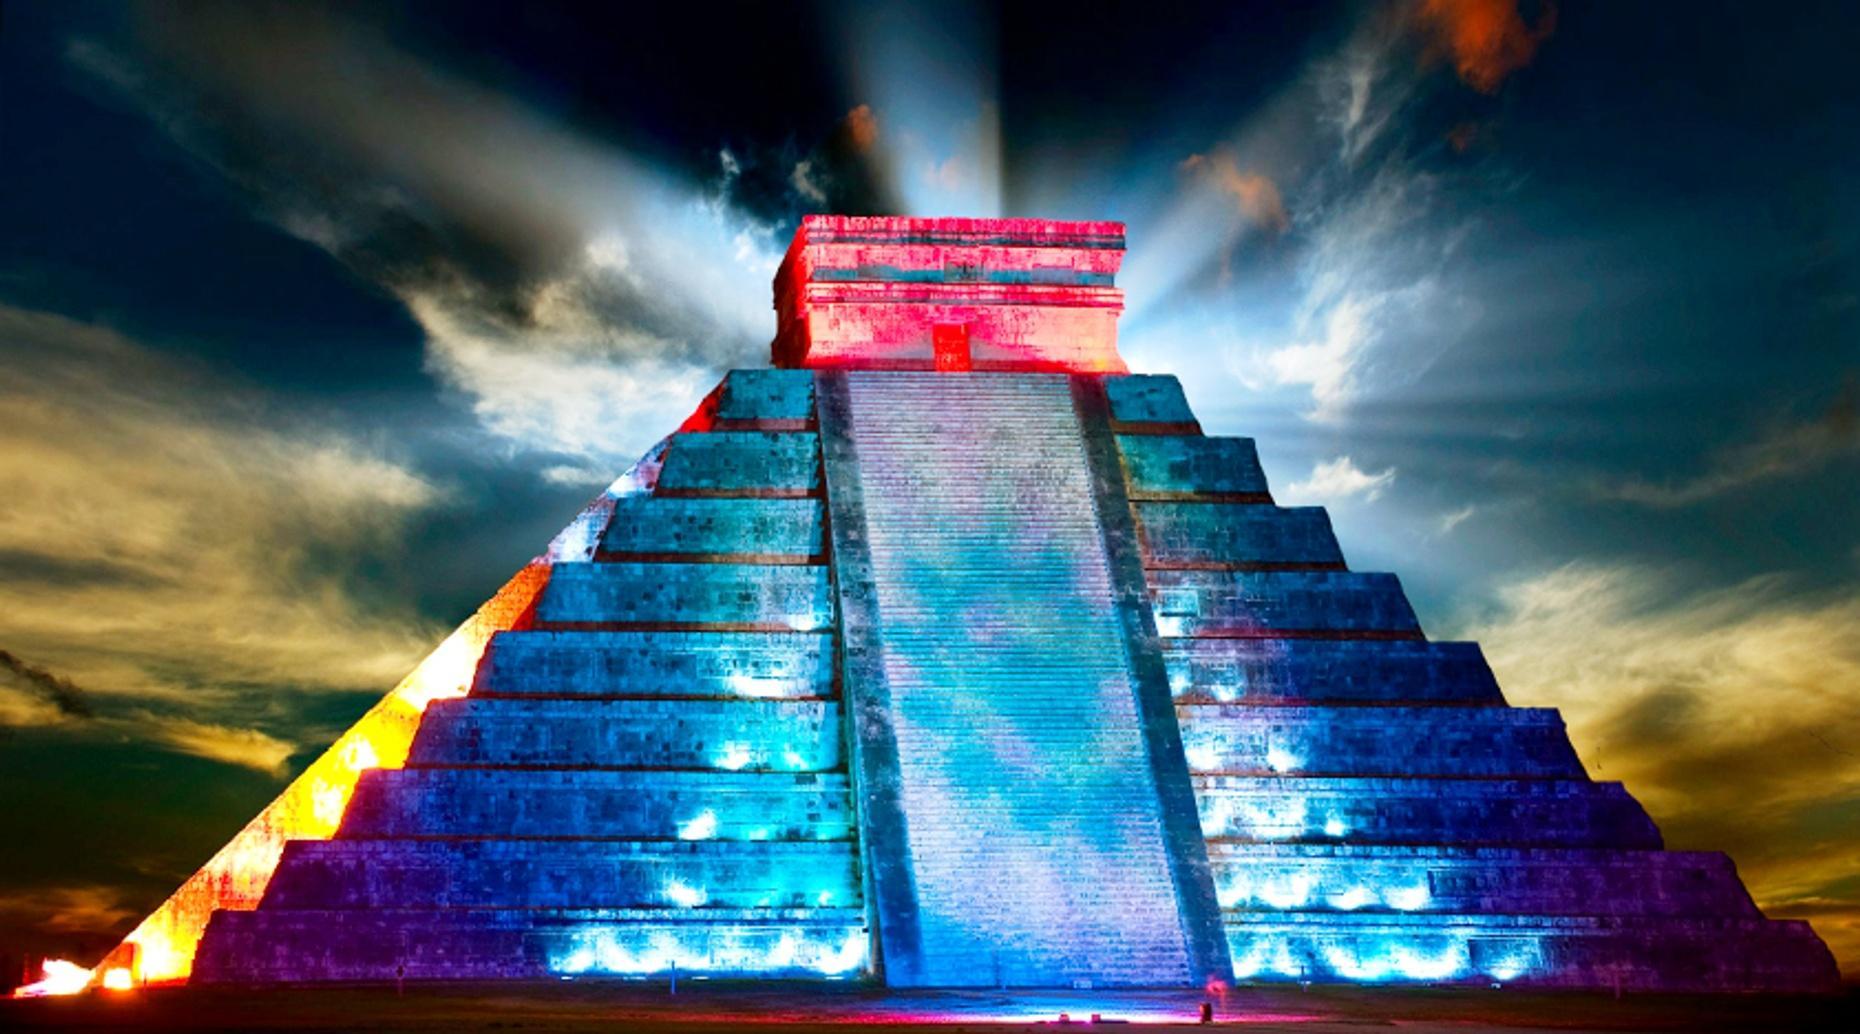 Chichen Itza Night Tour & Light Show